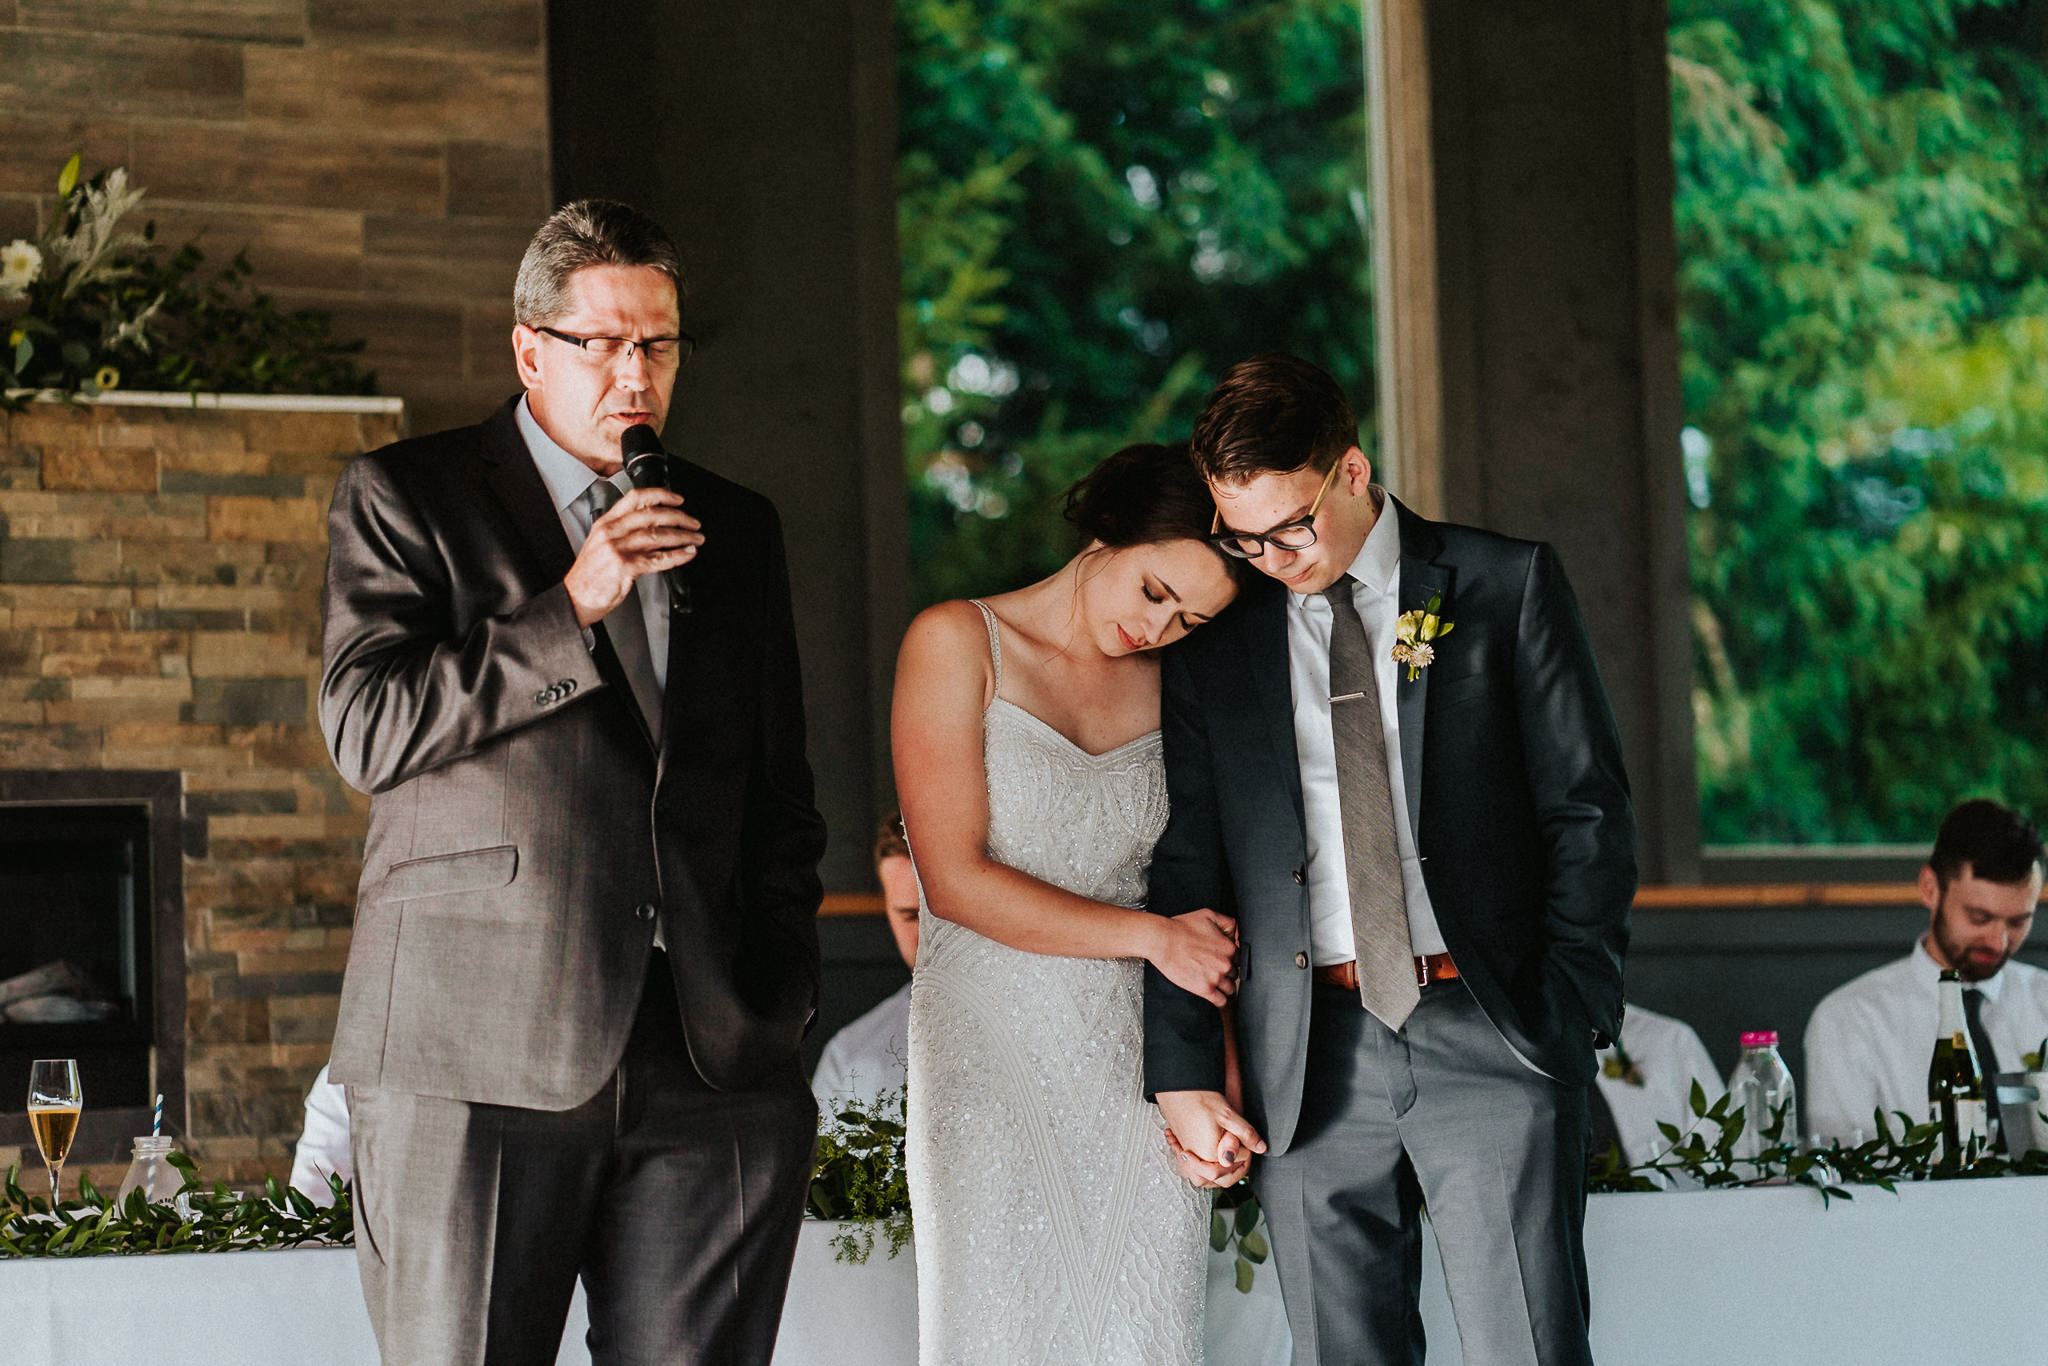 Father Bride Groom Prayer Blessing Wedding Union